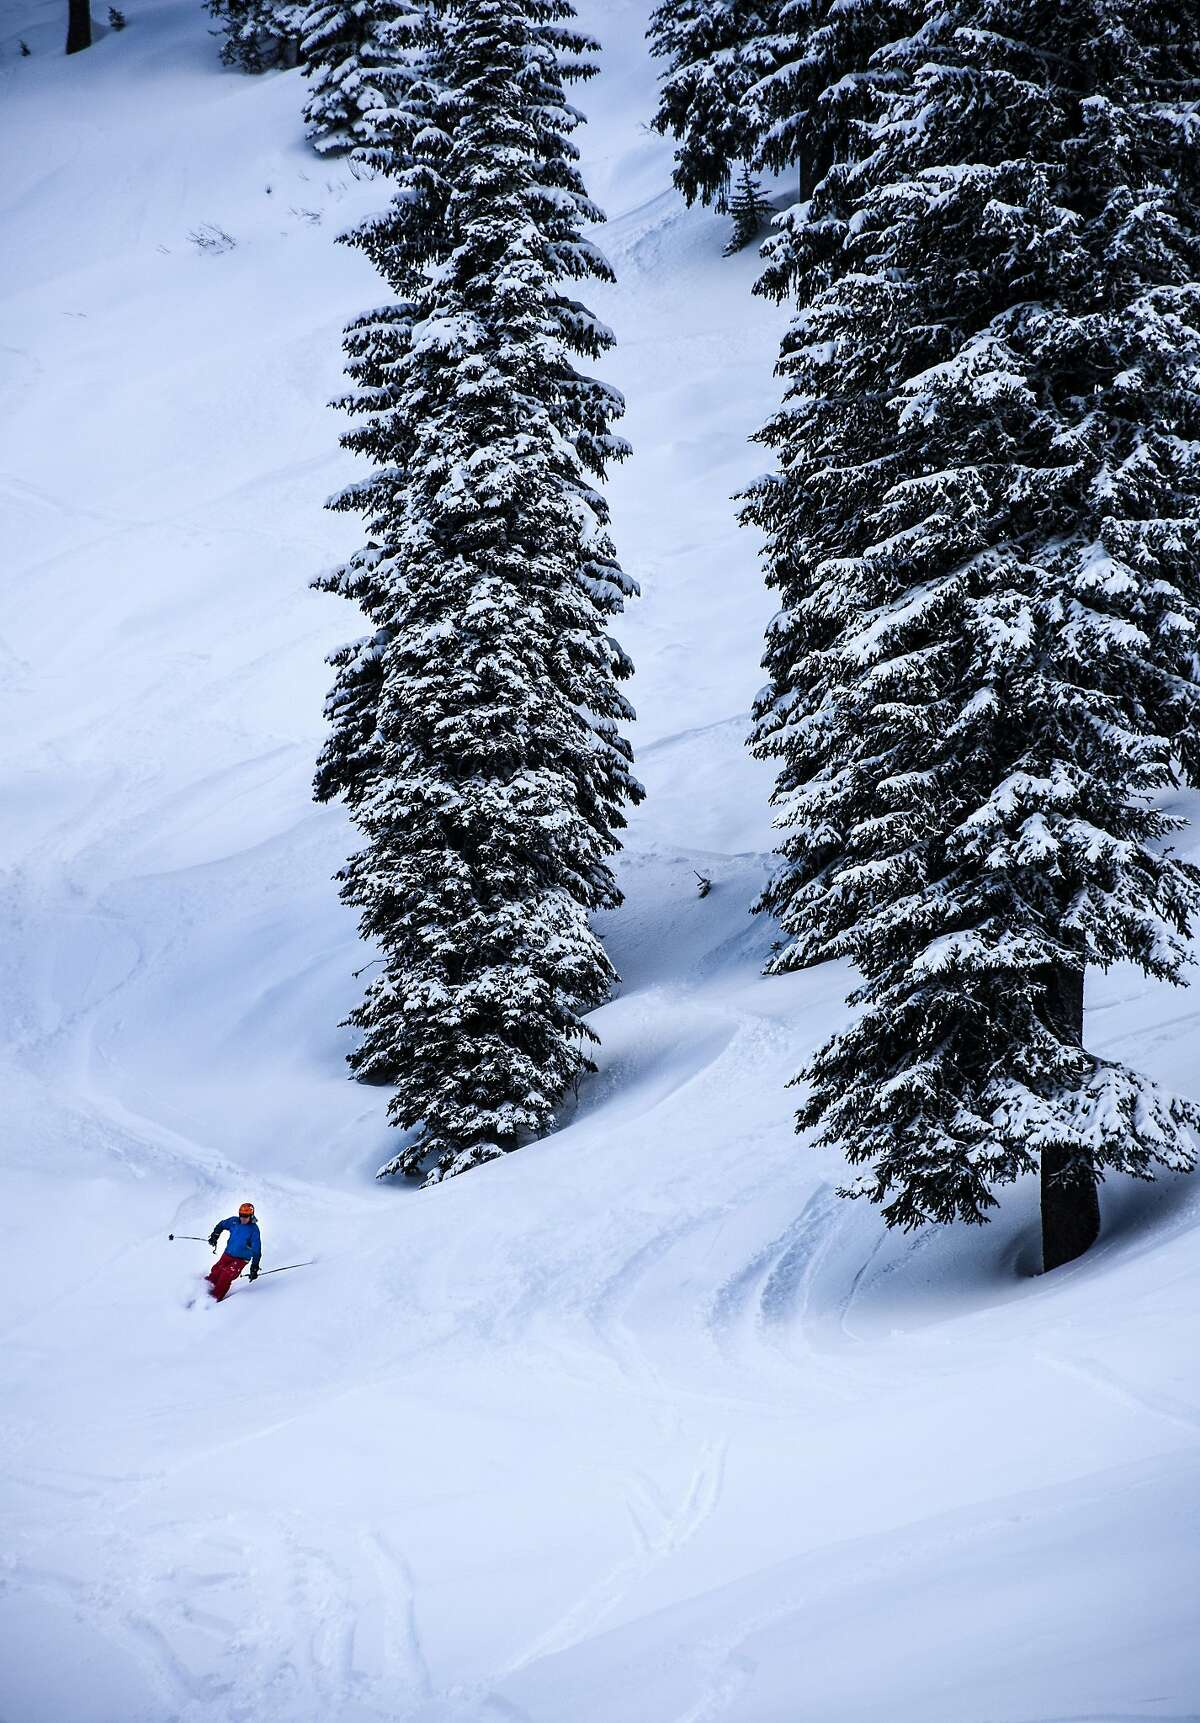 Shussing a powdery run at Whitewater Ski Resort.